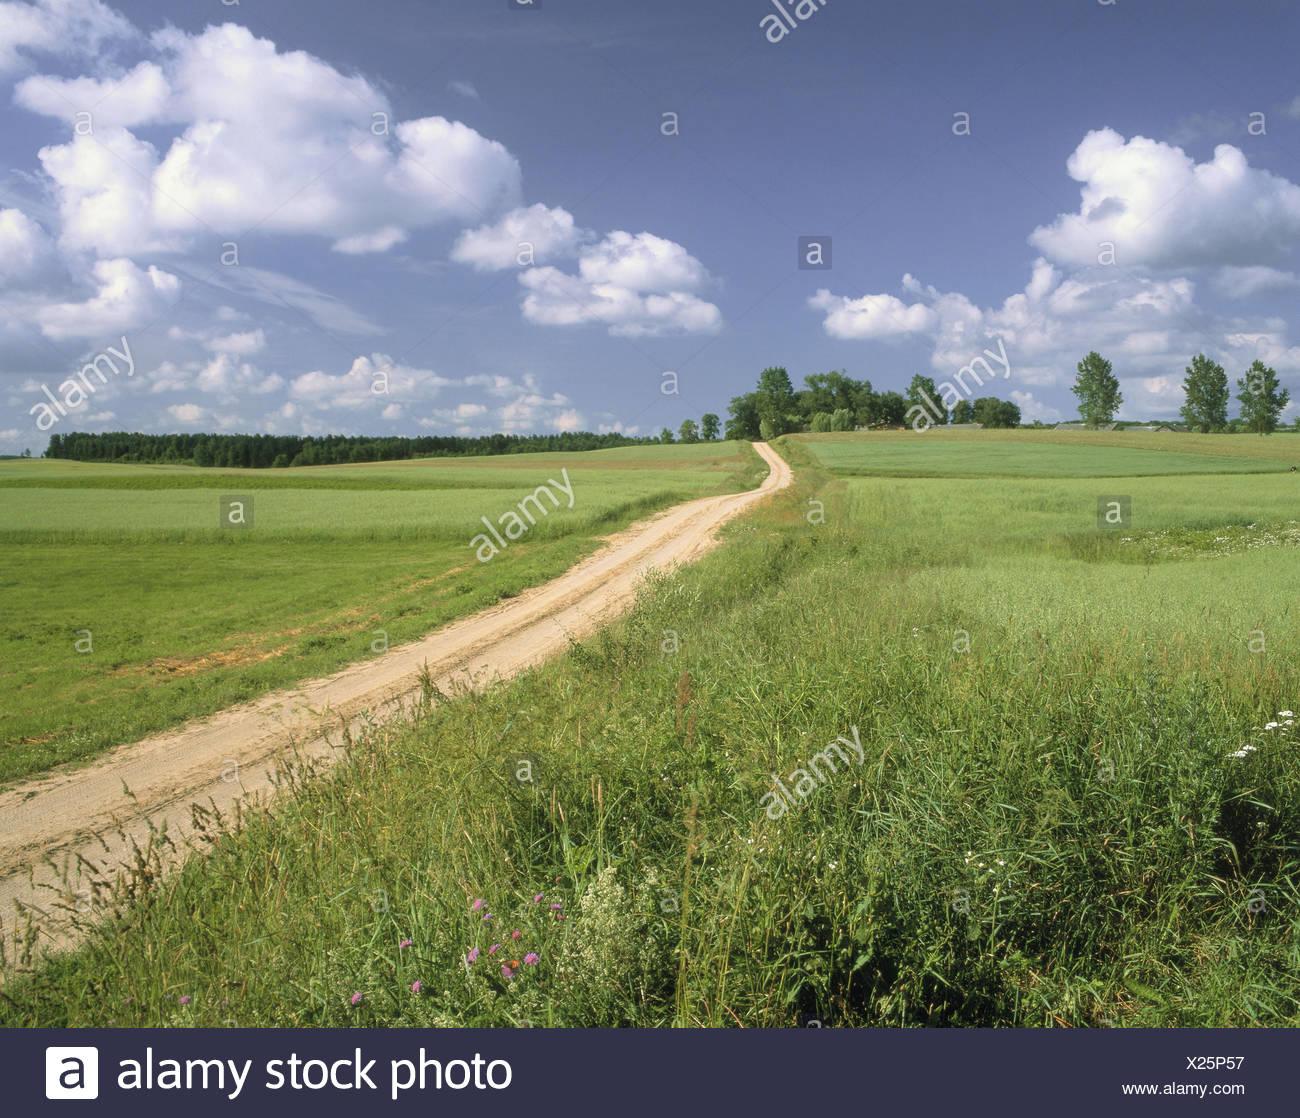 PL' Masuria, country lane - Stock Image